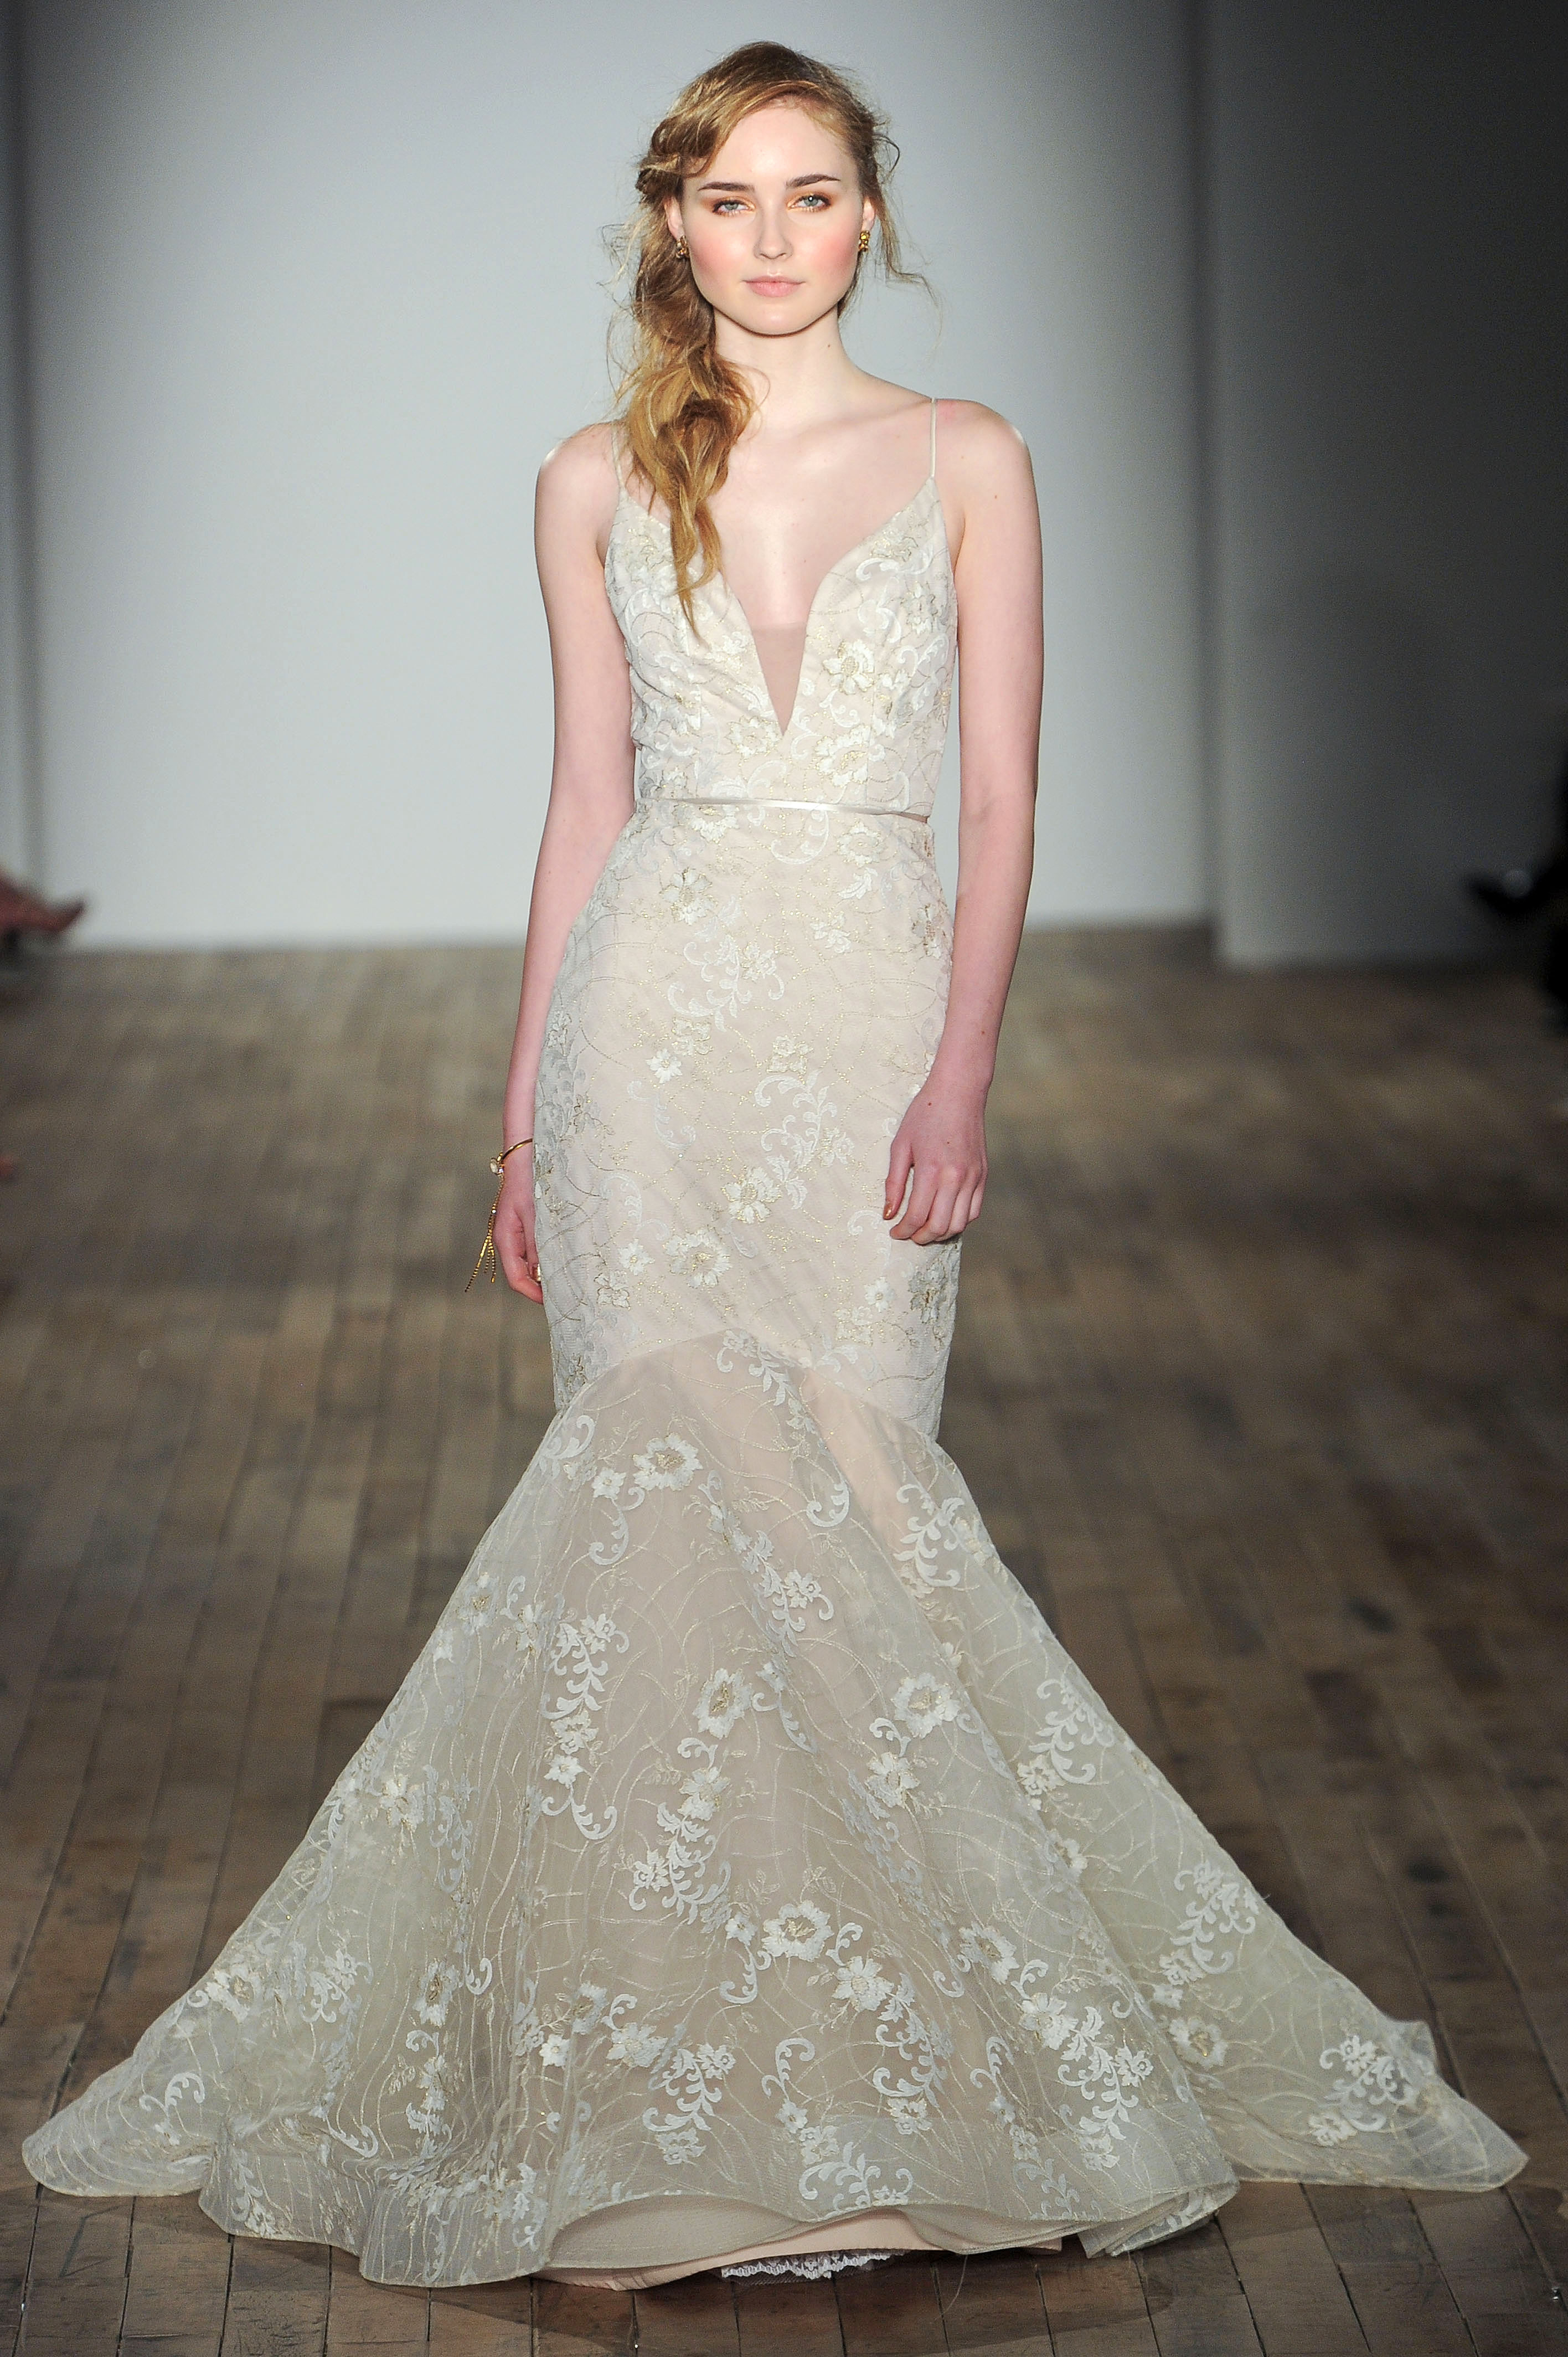 jlm tara keely mermaid spaghetti strap wedding dress spring 2018